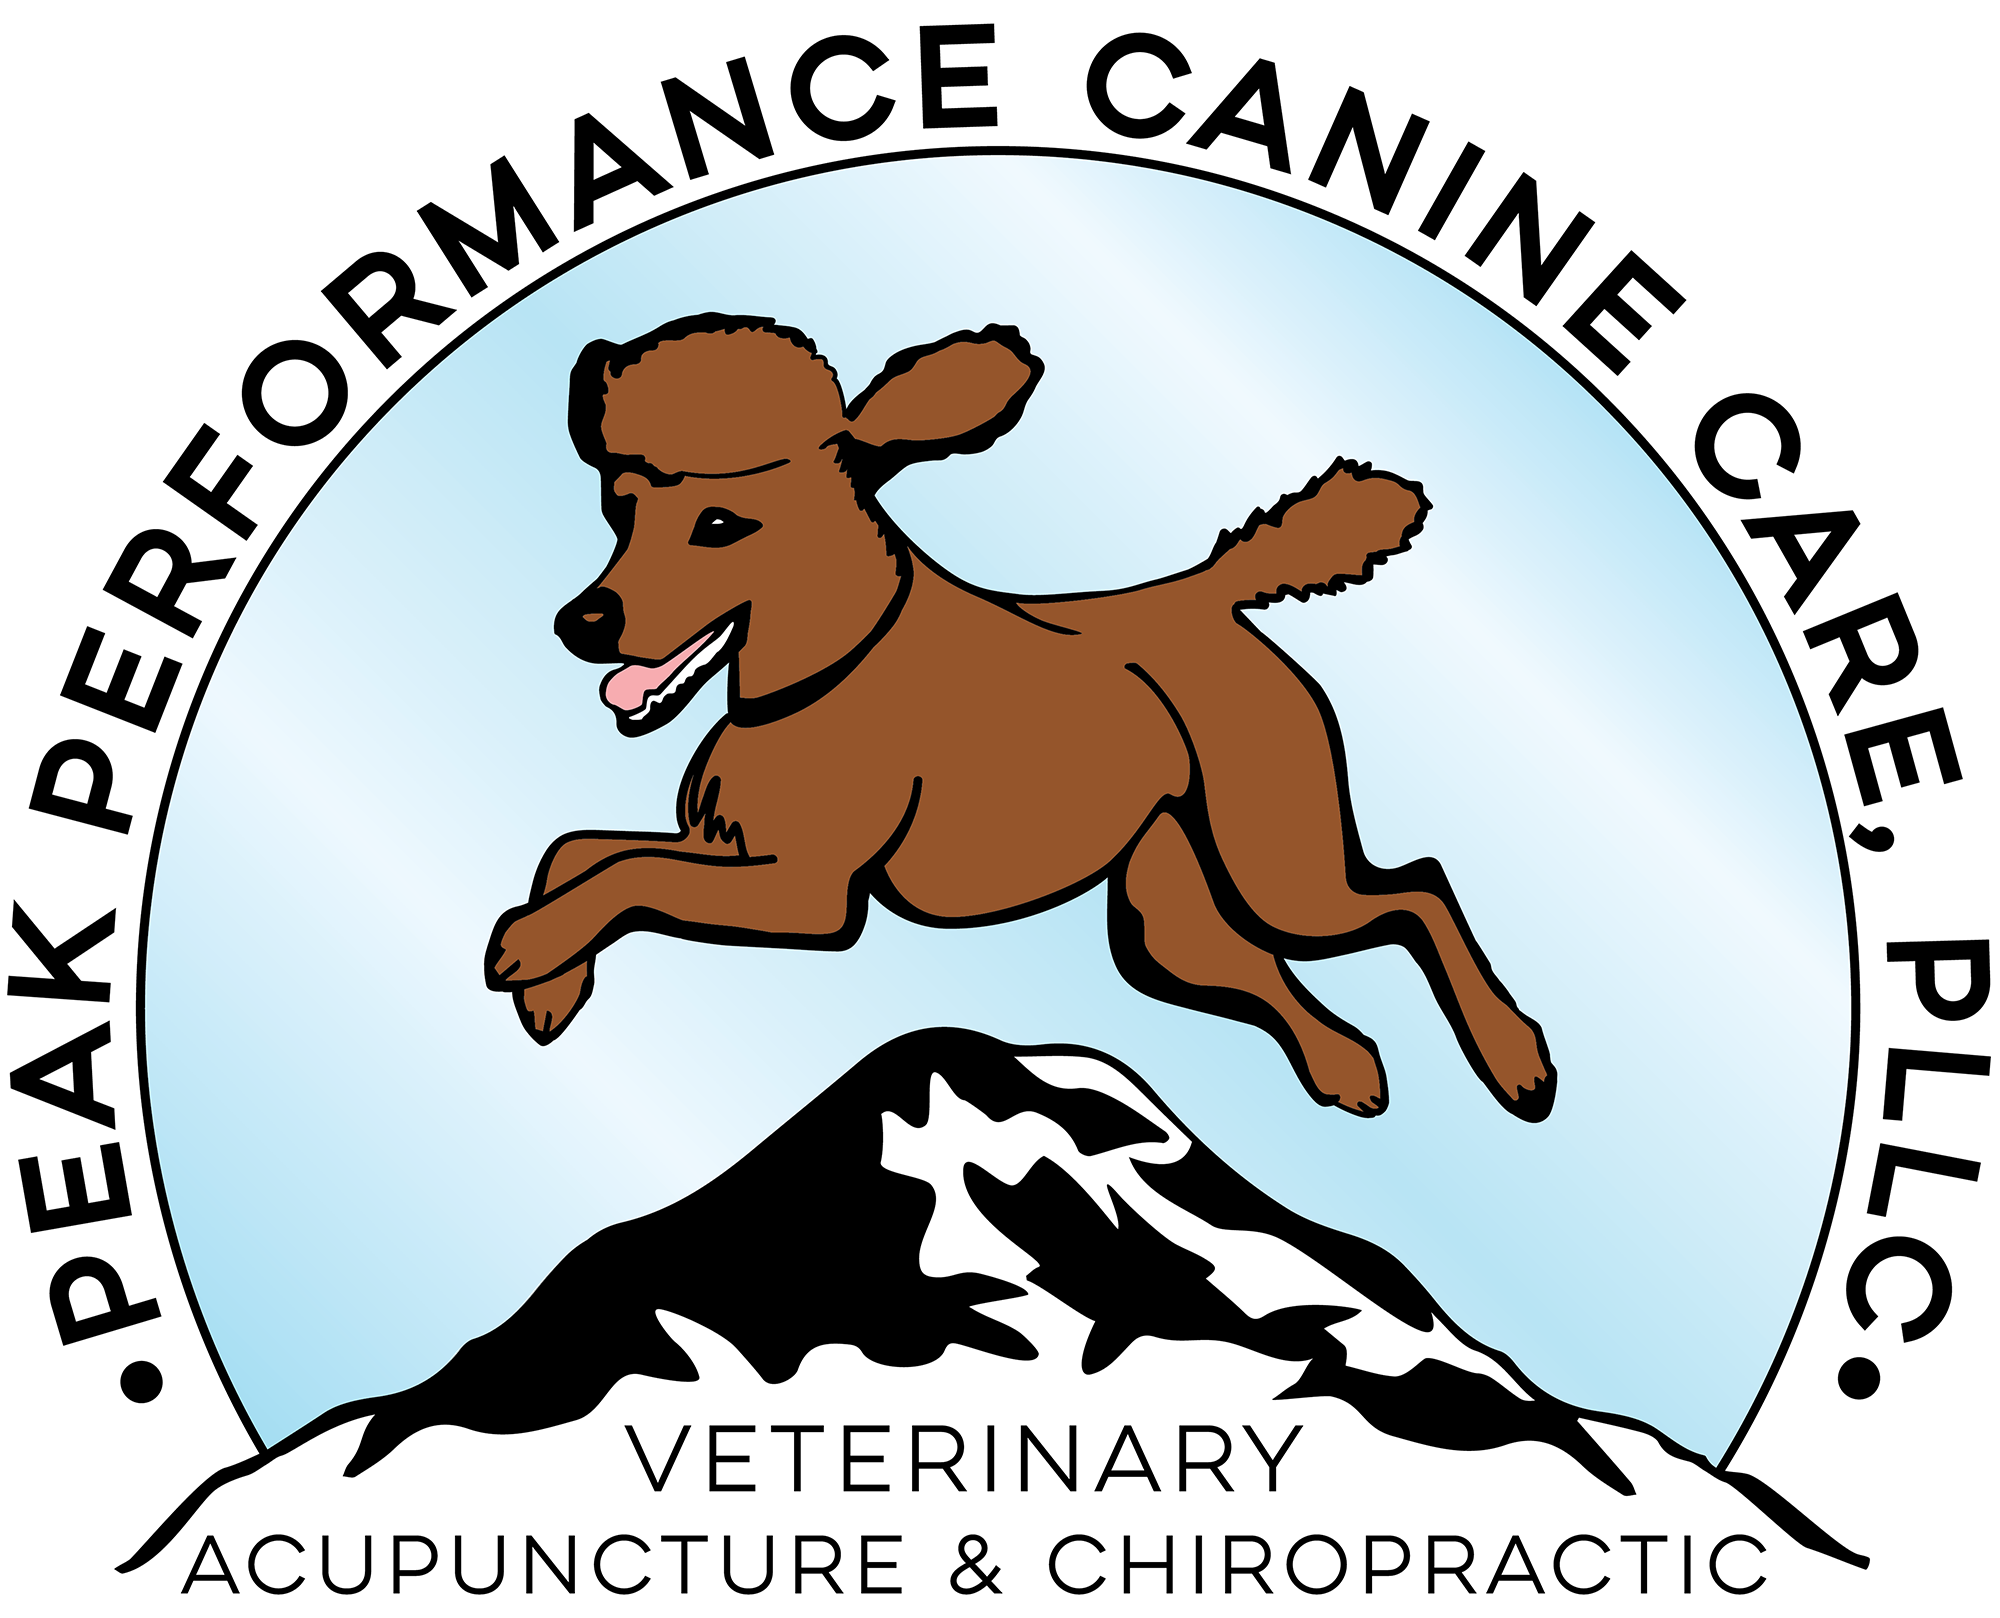 Peak Performance Canine Care, PLLC